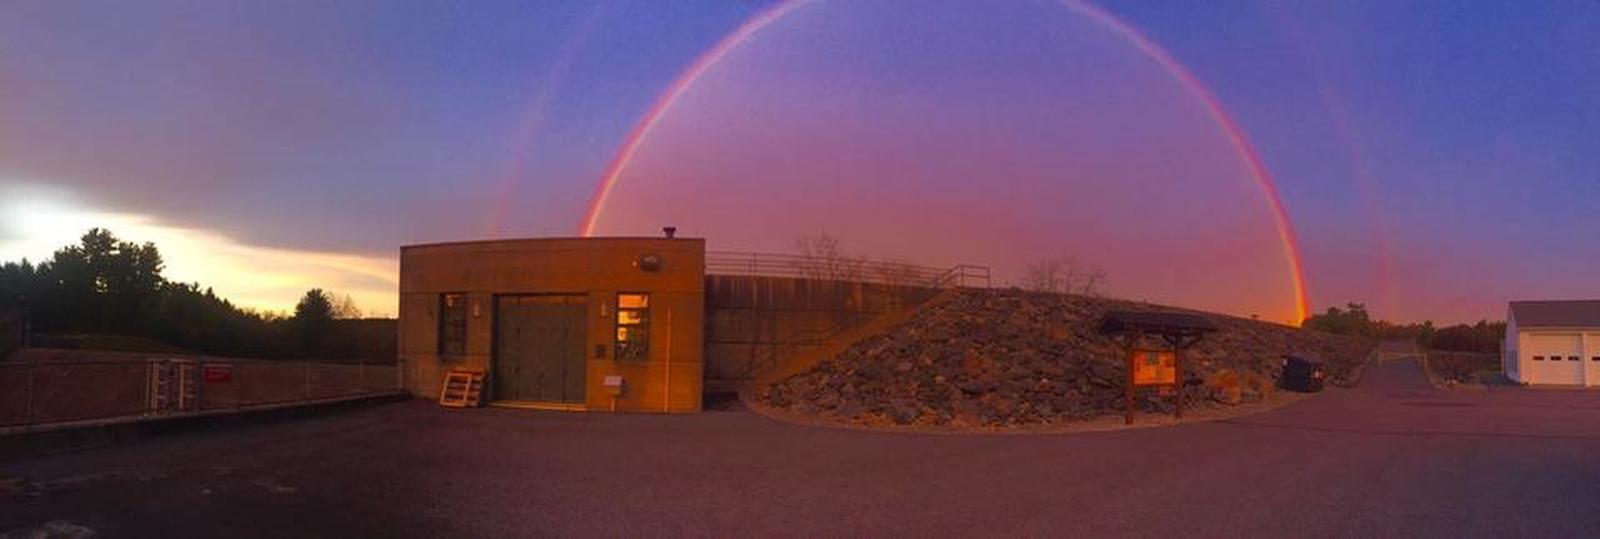 Calm after a stormControl tower at Buffumville Dam